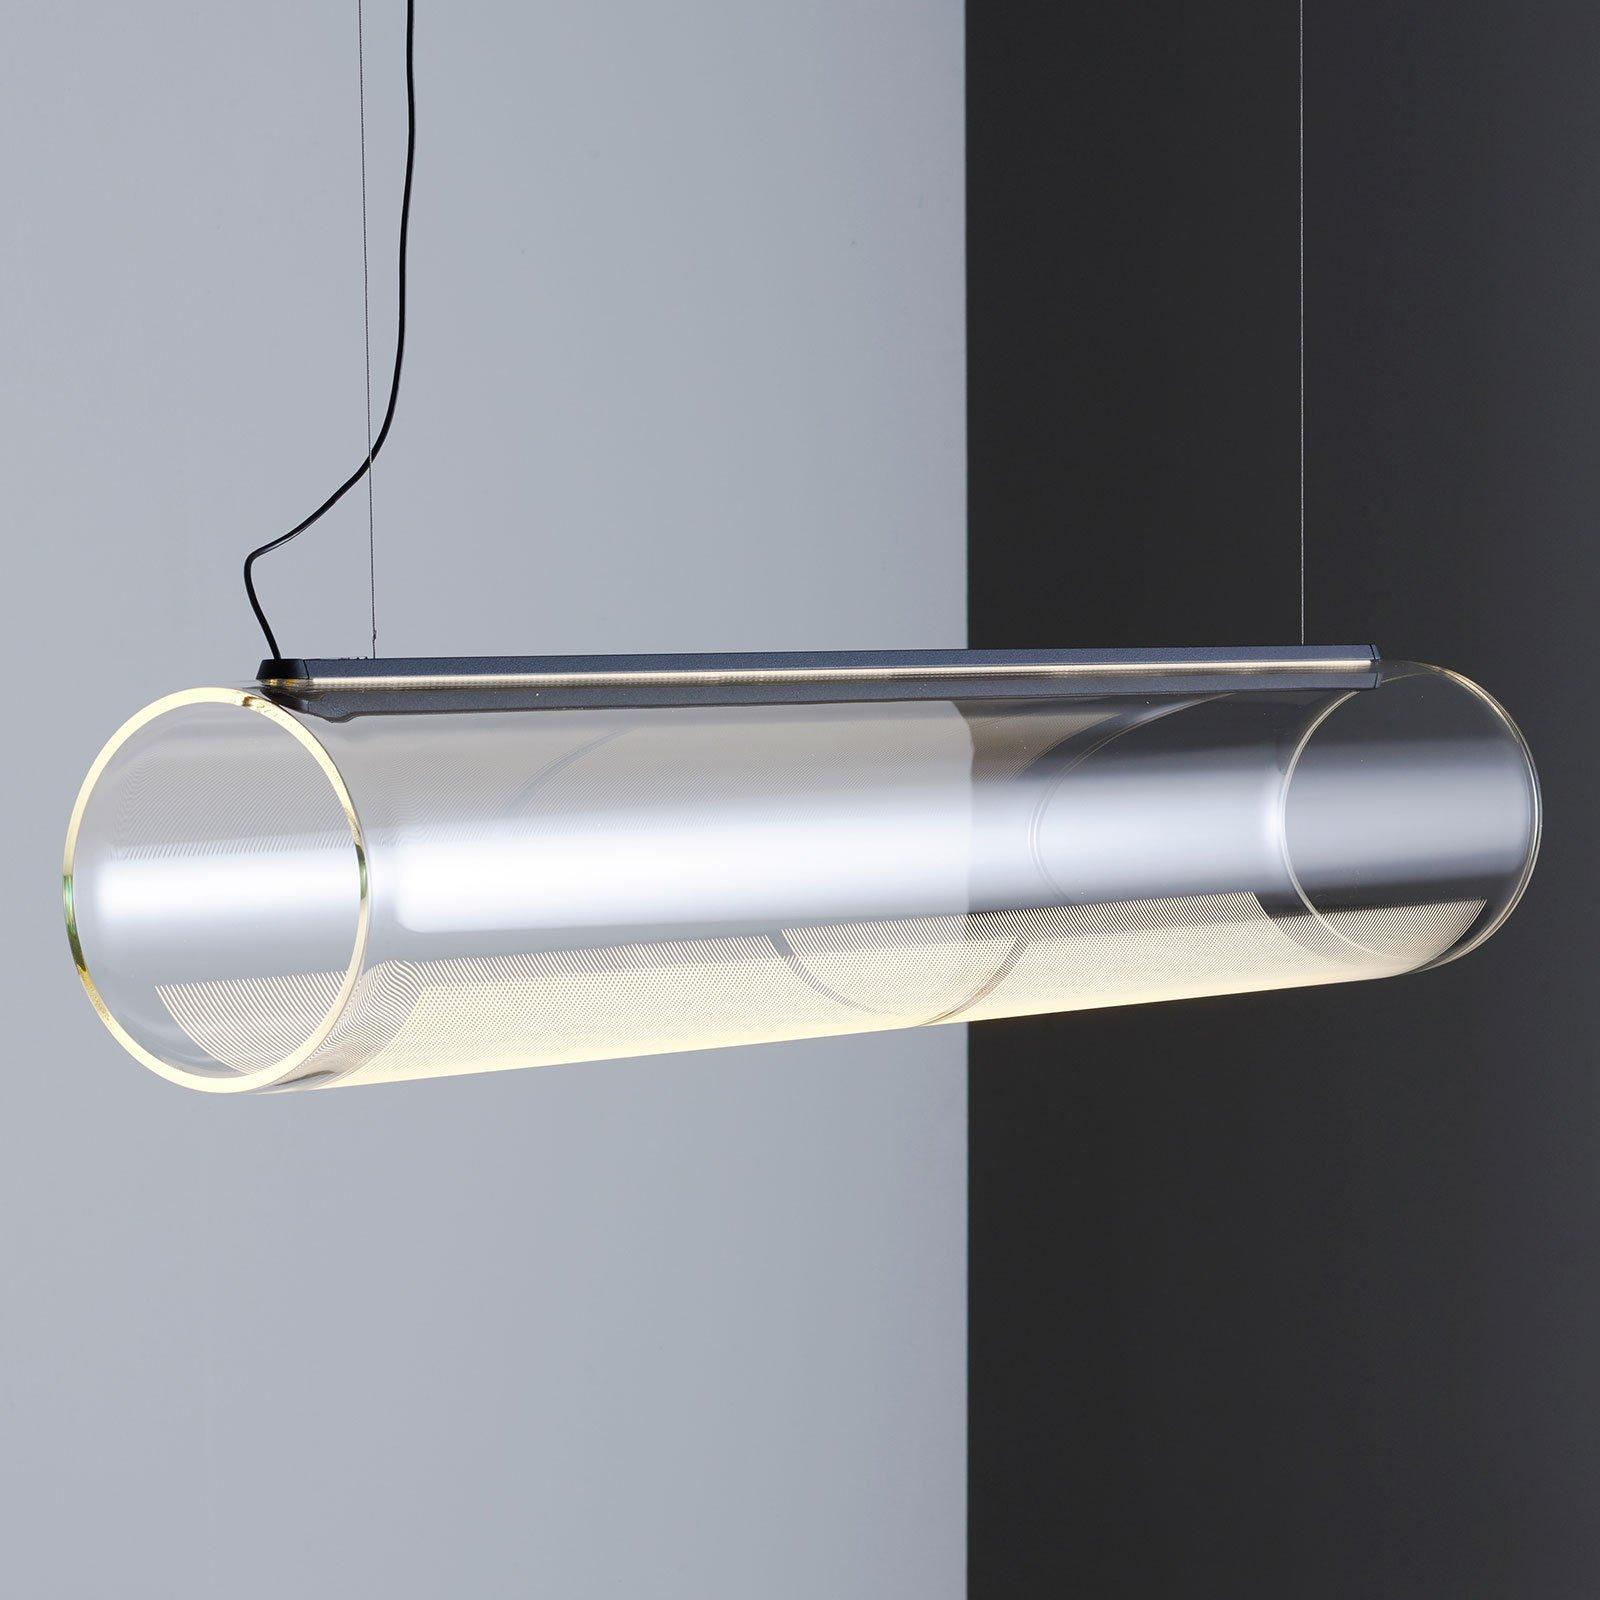 Vibia Guise 2277 LED-hengelampe, lengde 89 cm